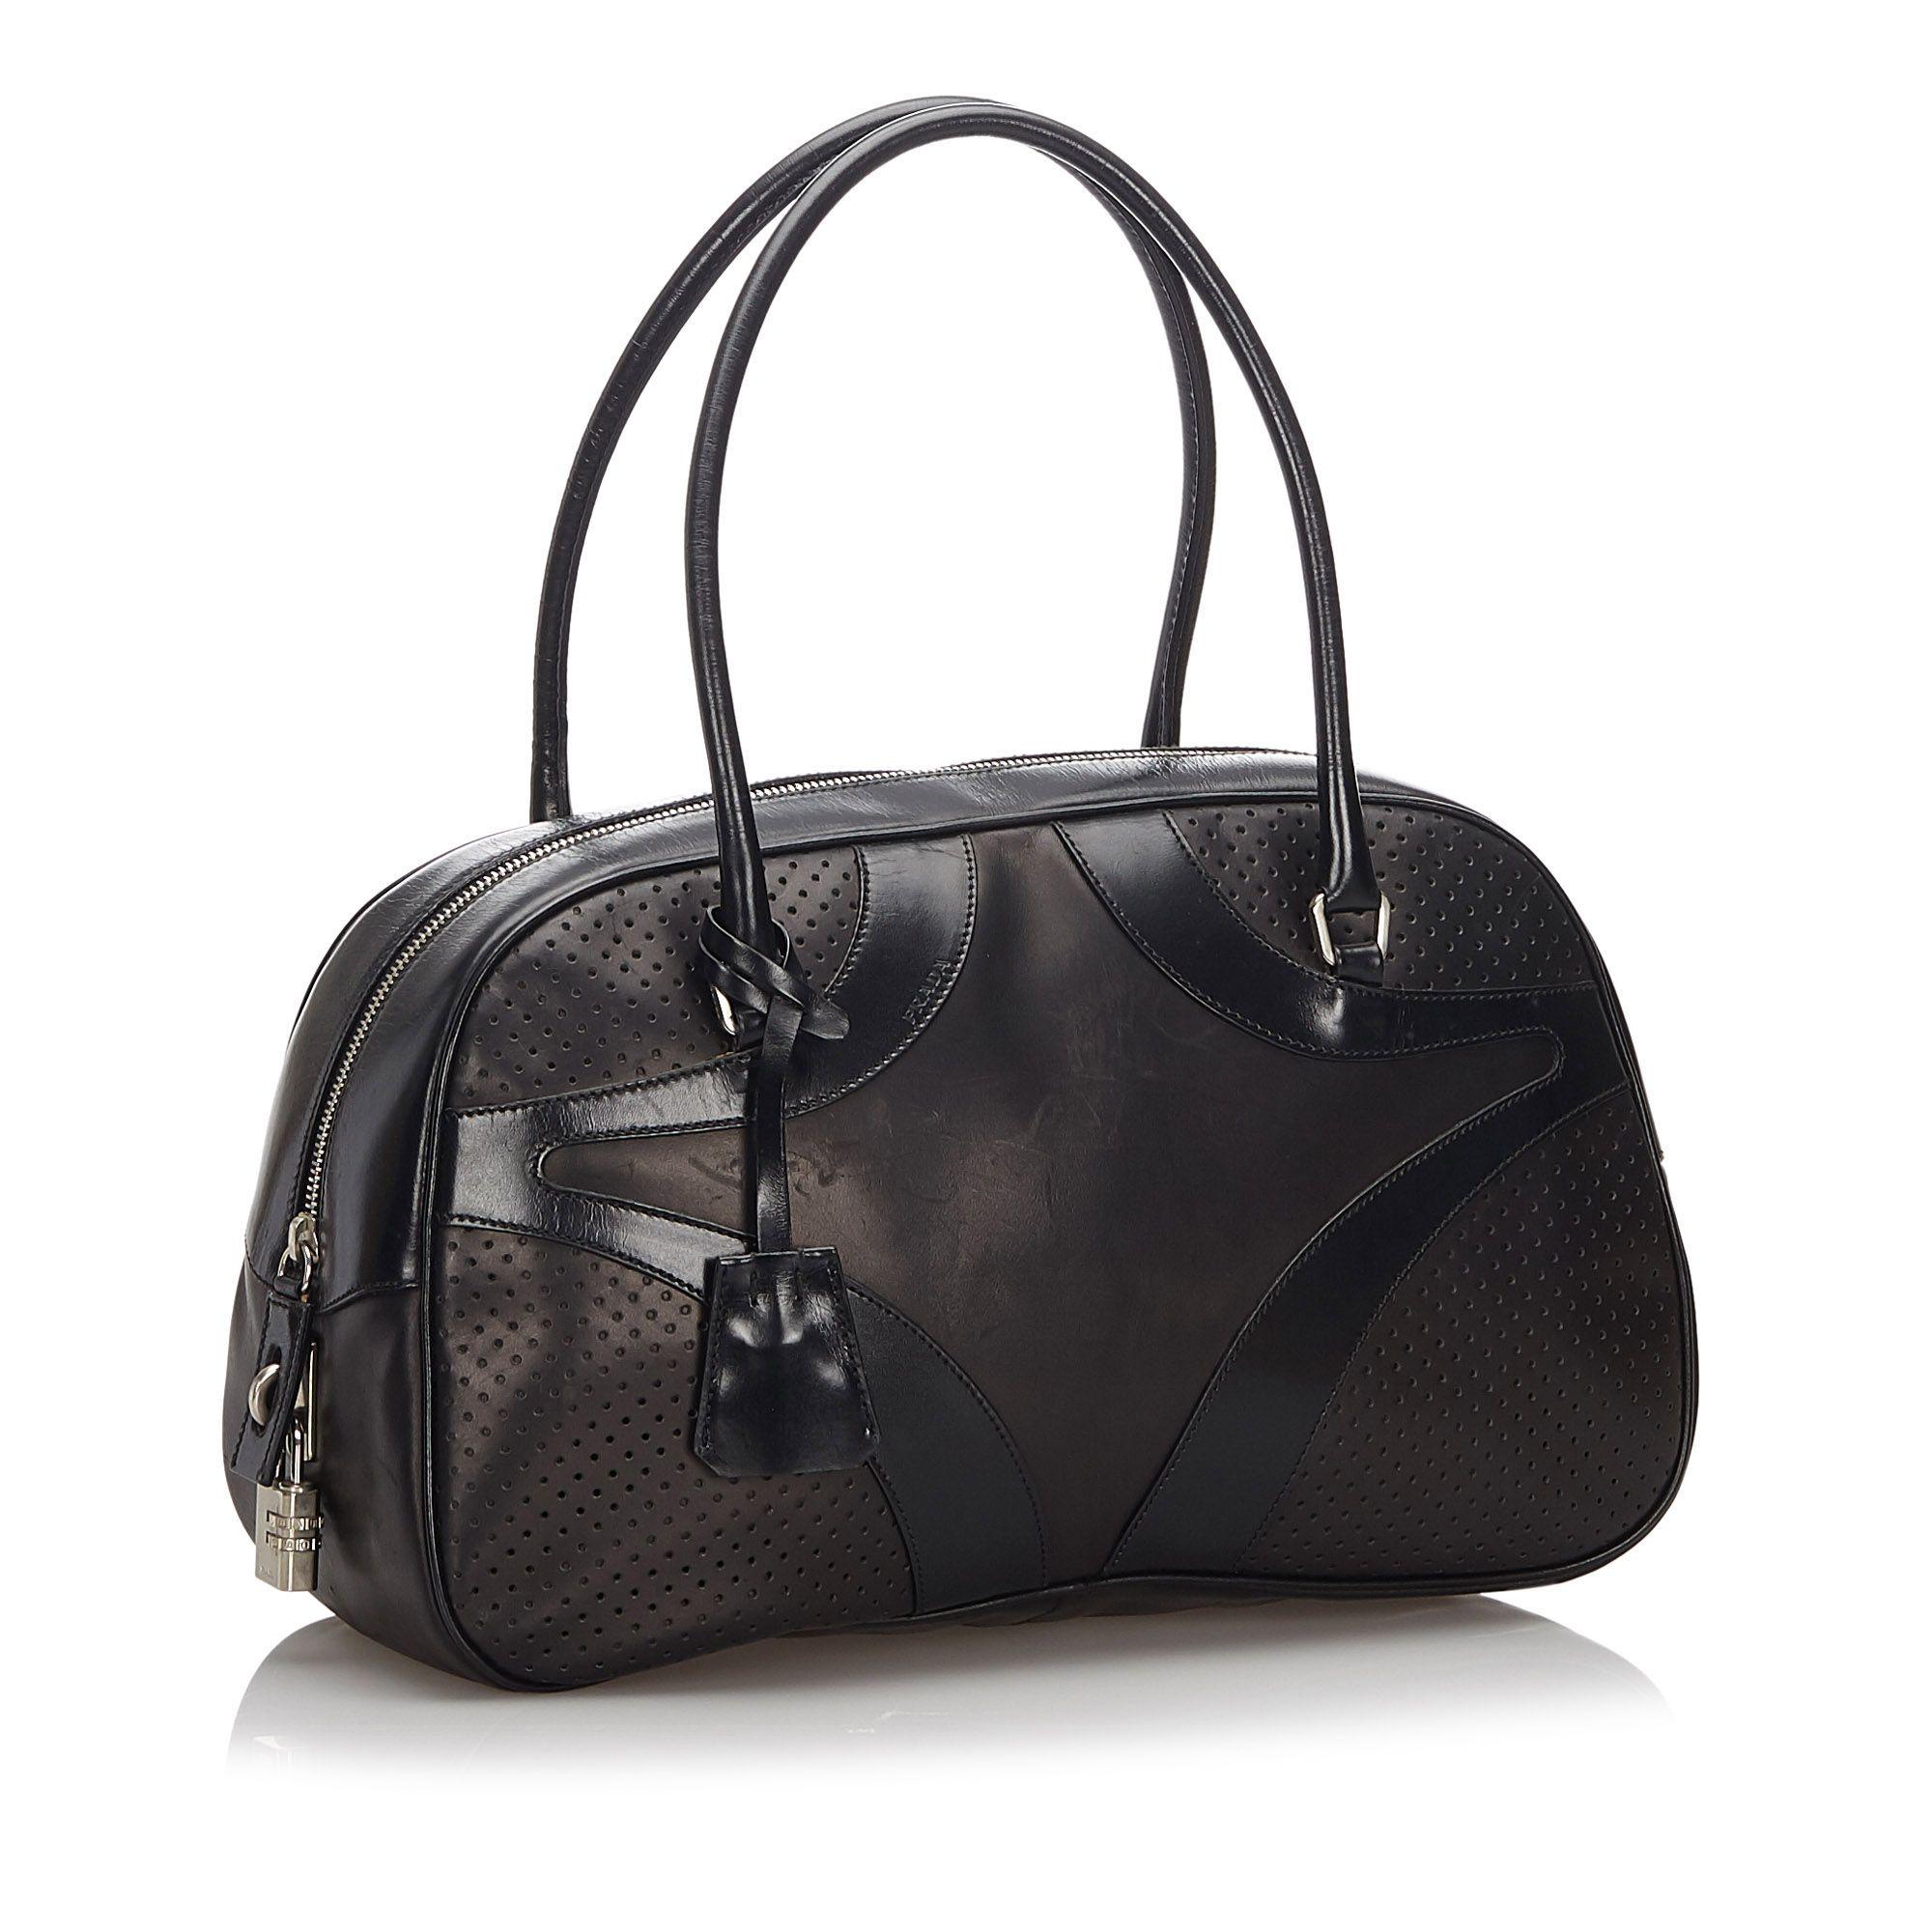 Vintage Prada Leather Vitello Drive Bowler Handbag Black